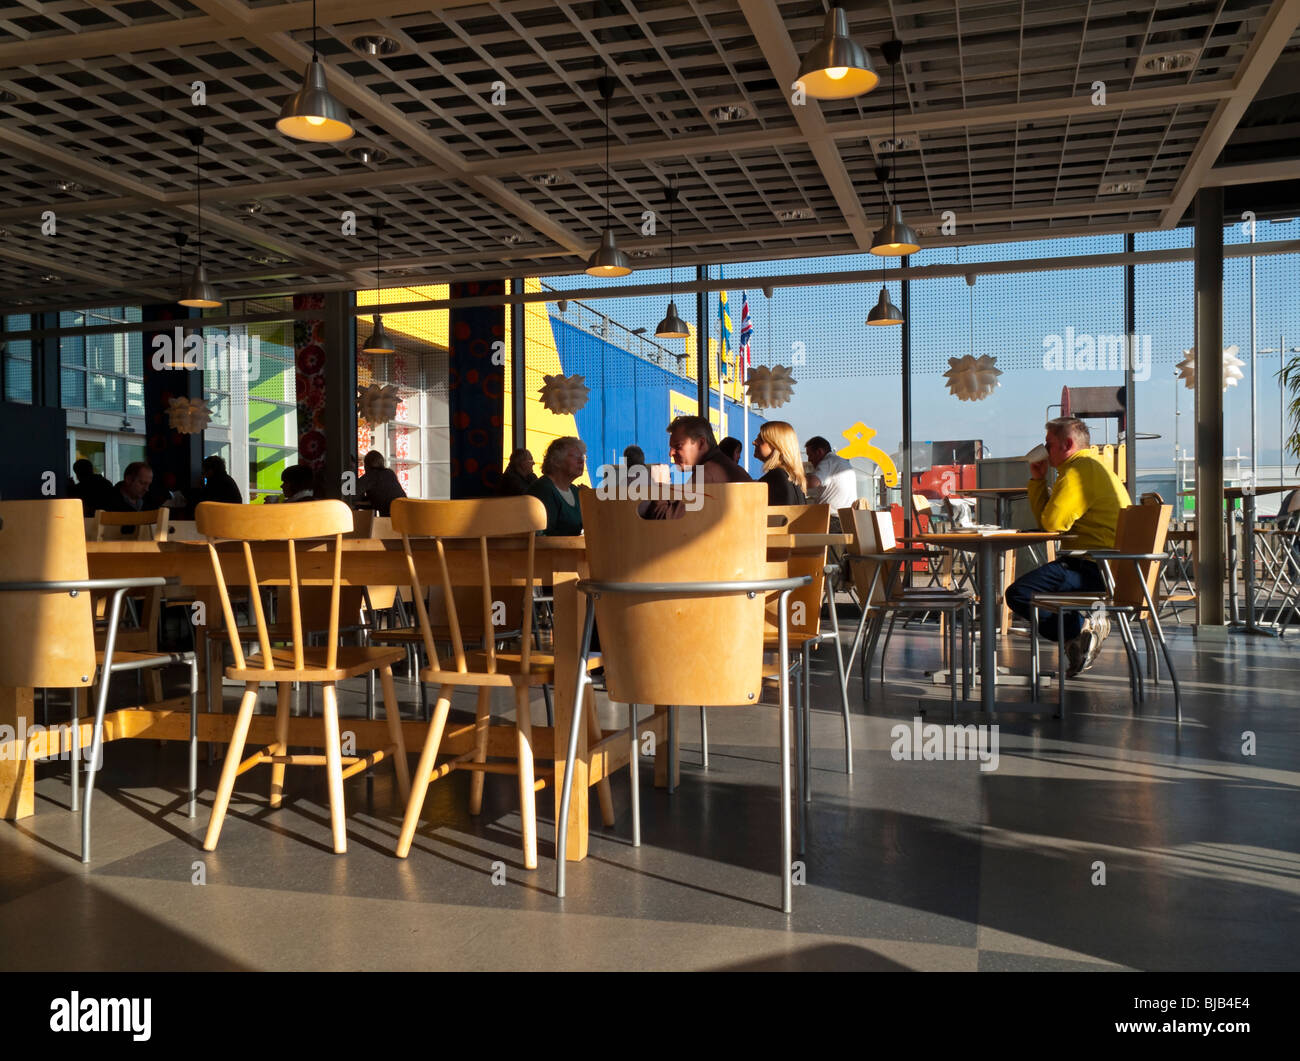 Interior of ikea cafe at giltbrook retail park near